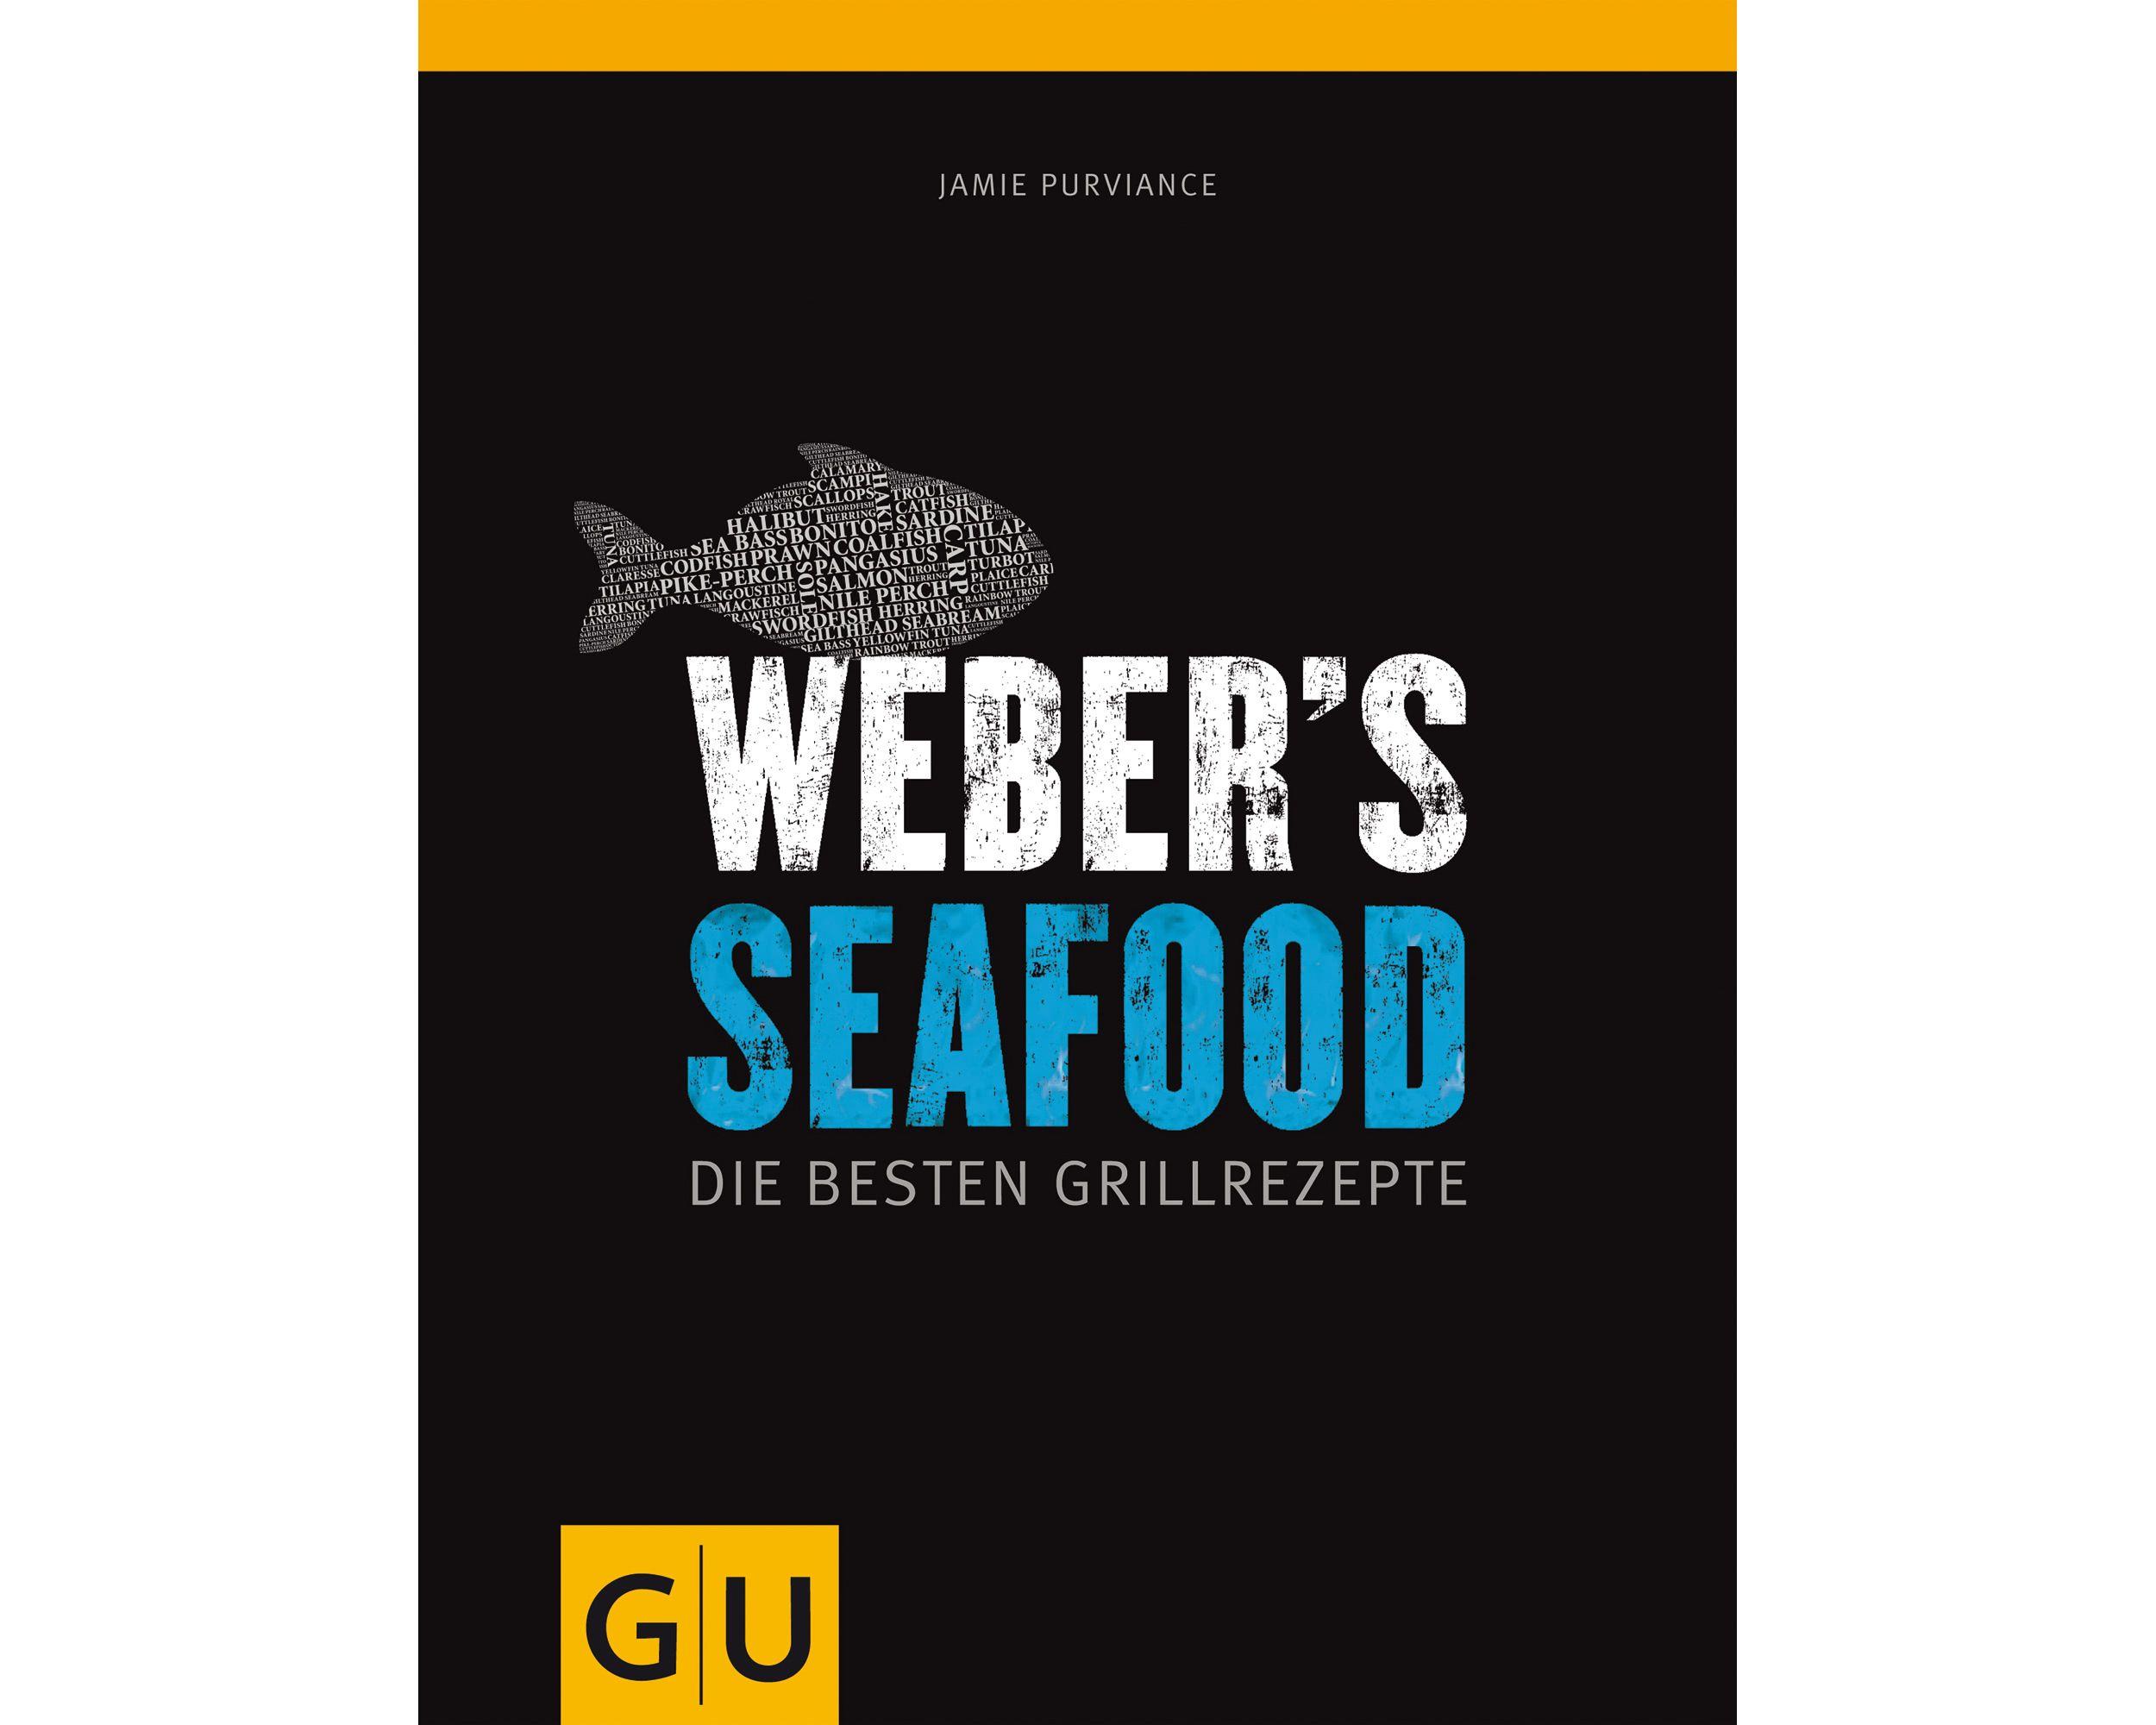 Webers® Seafood, Buch